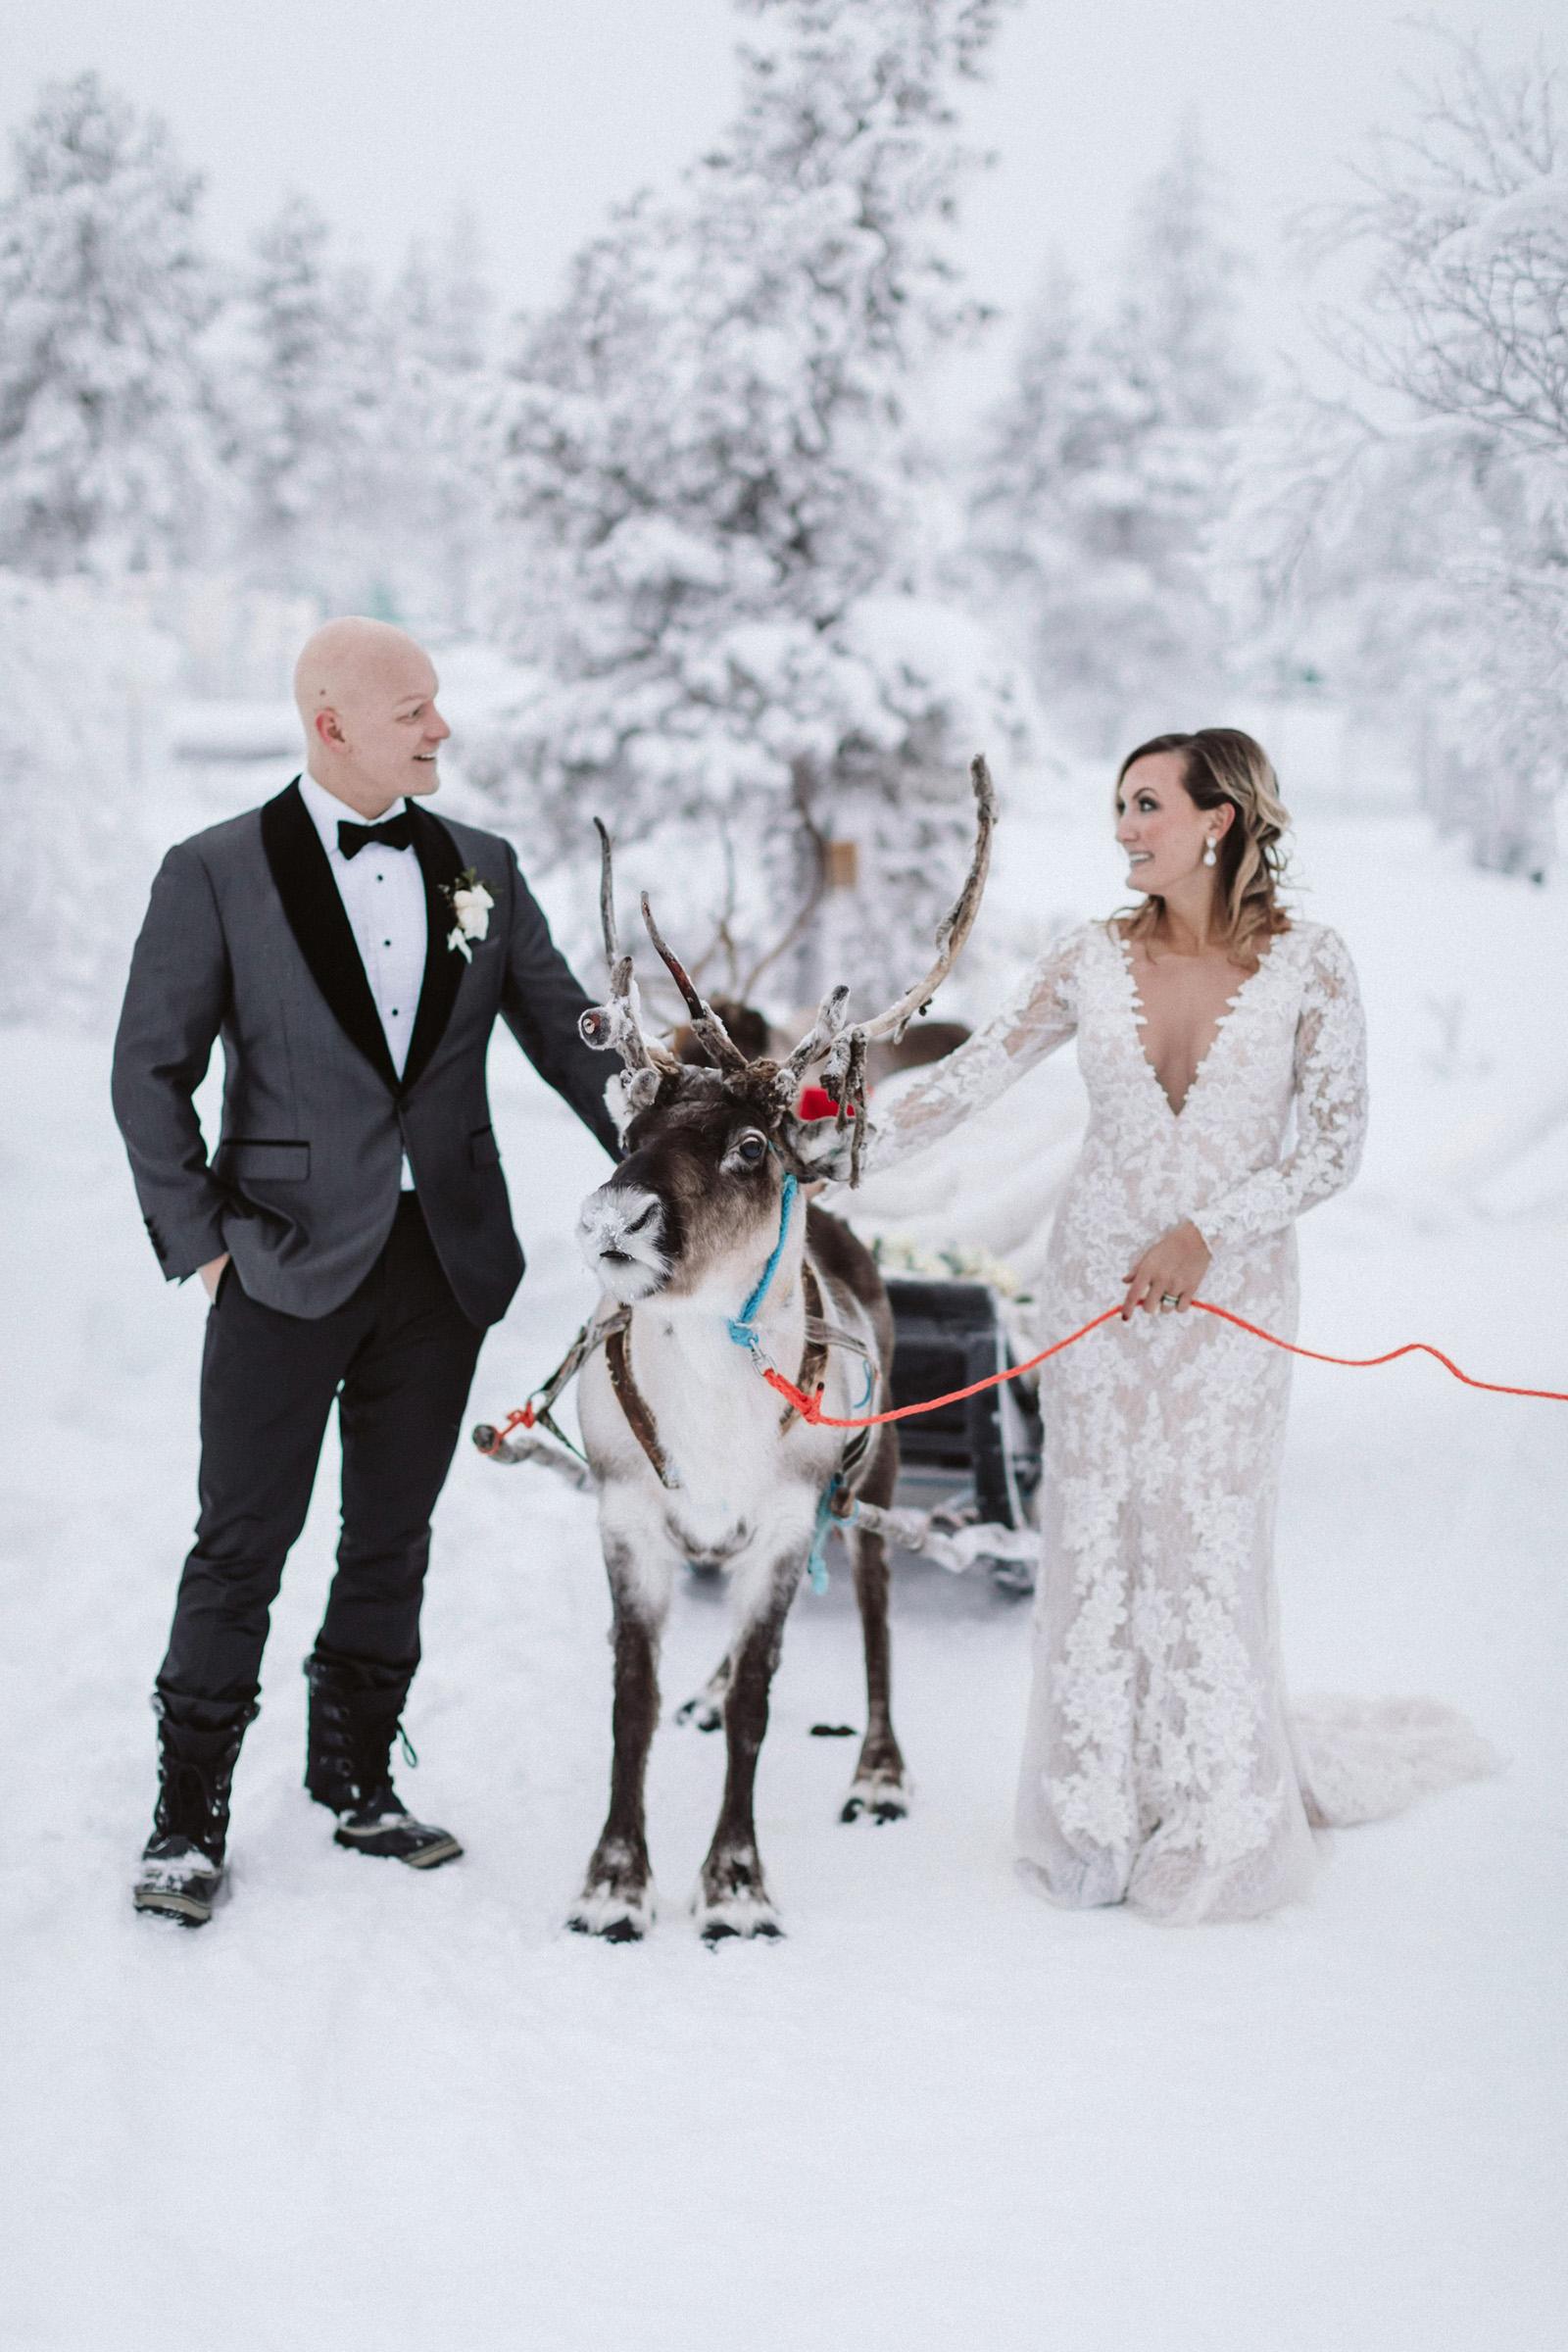 Lapland photo shoot